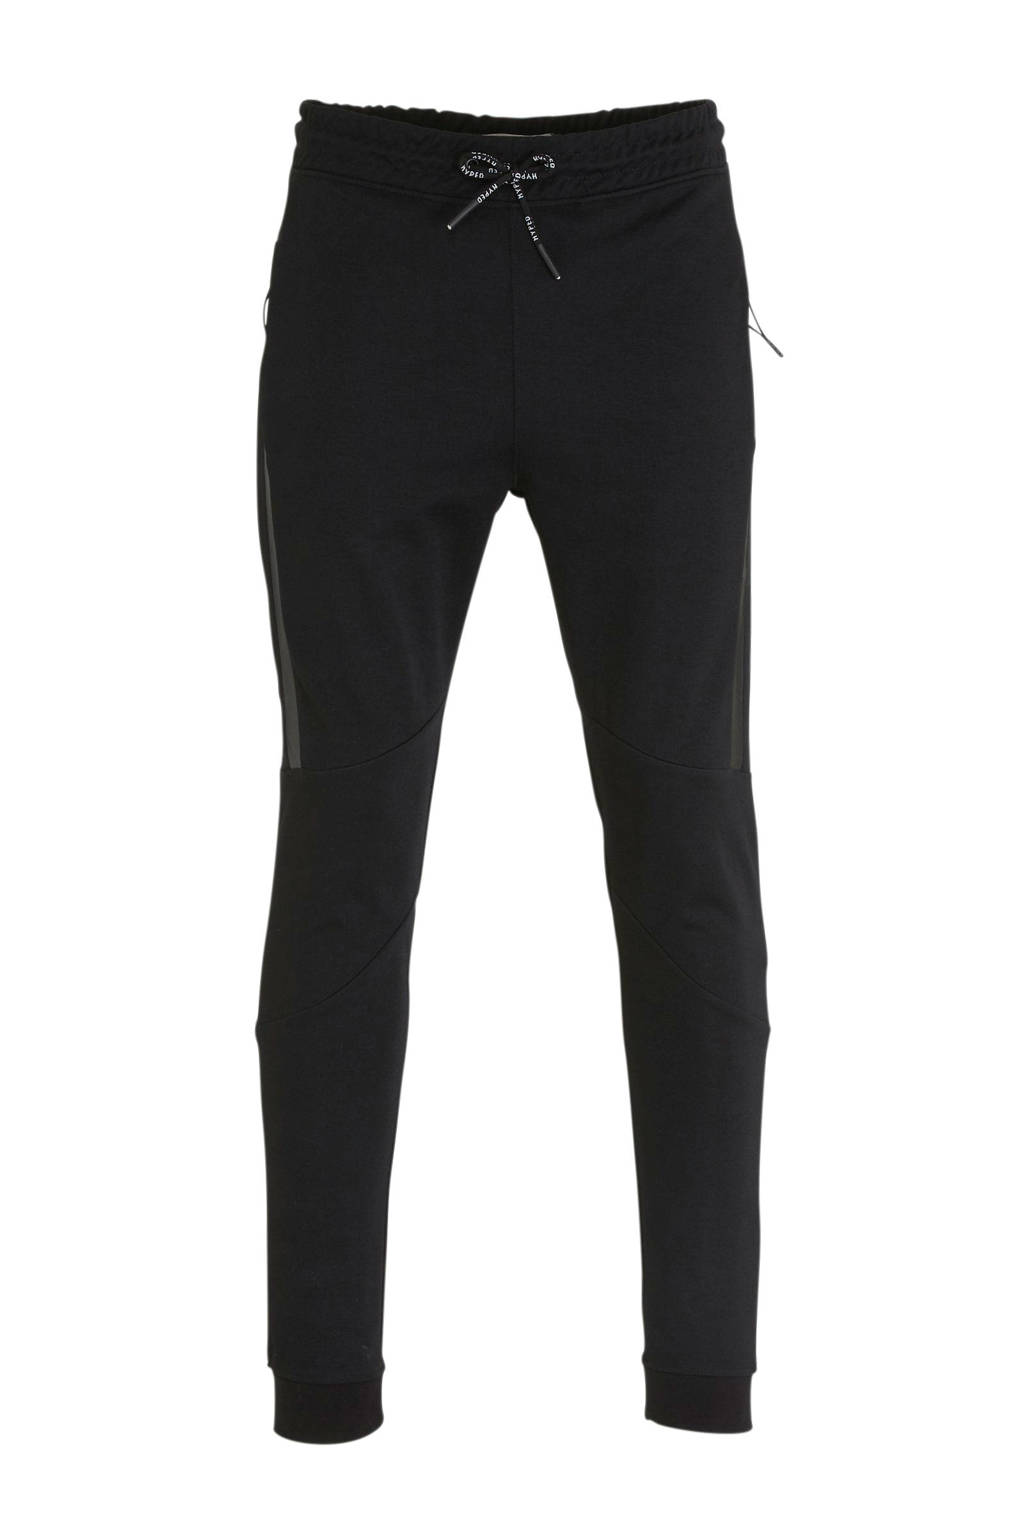 C&A Clockhouse slim fit joggingbroek zwart, Zwart